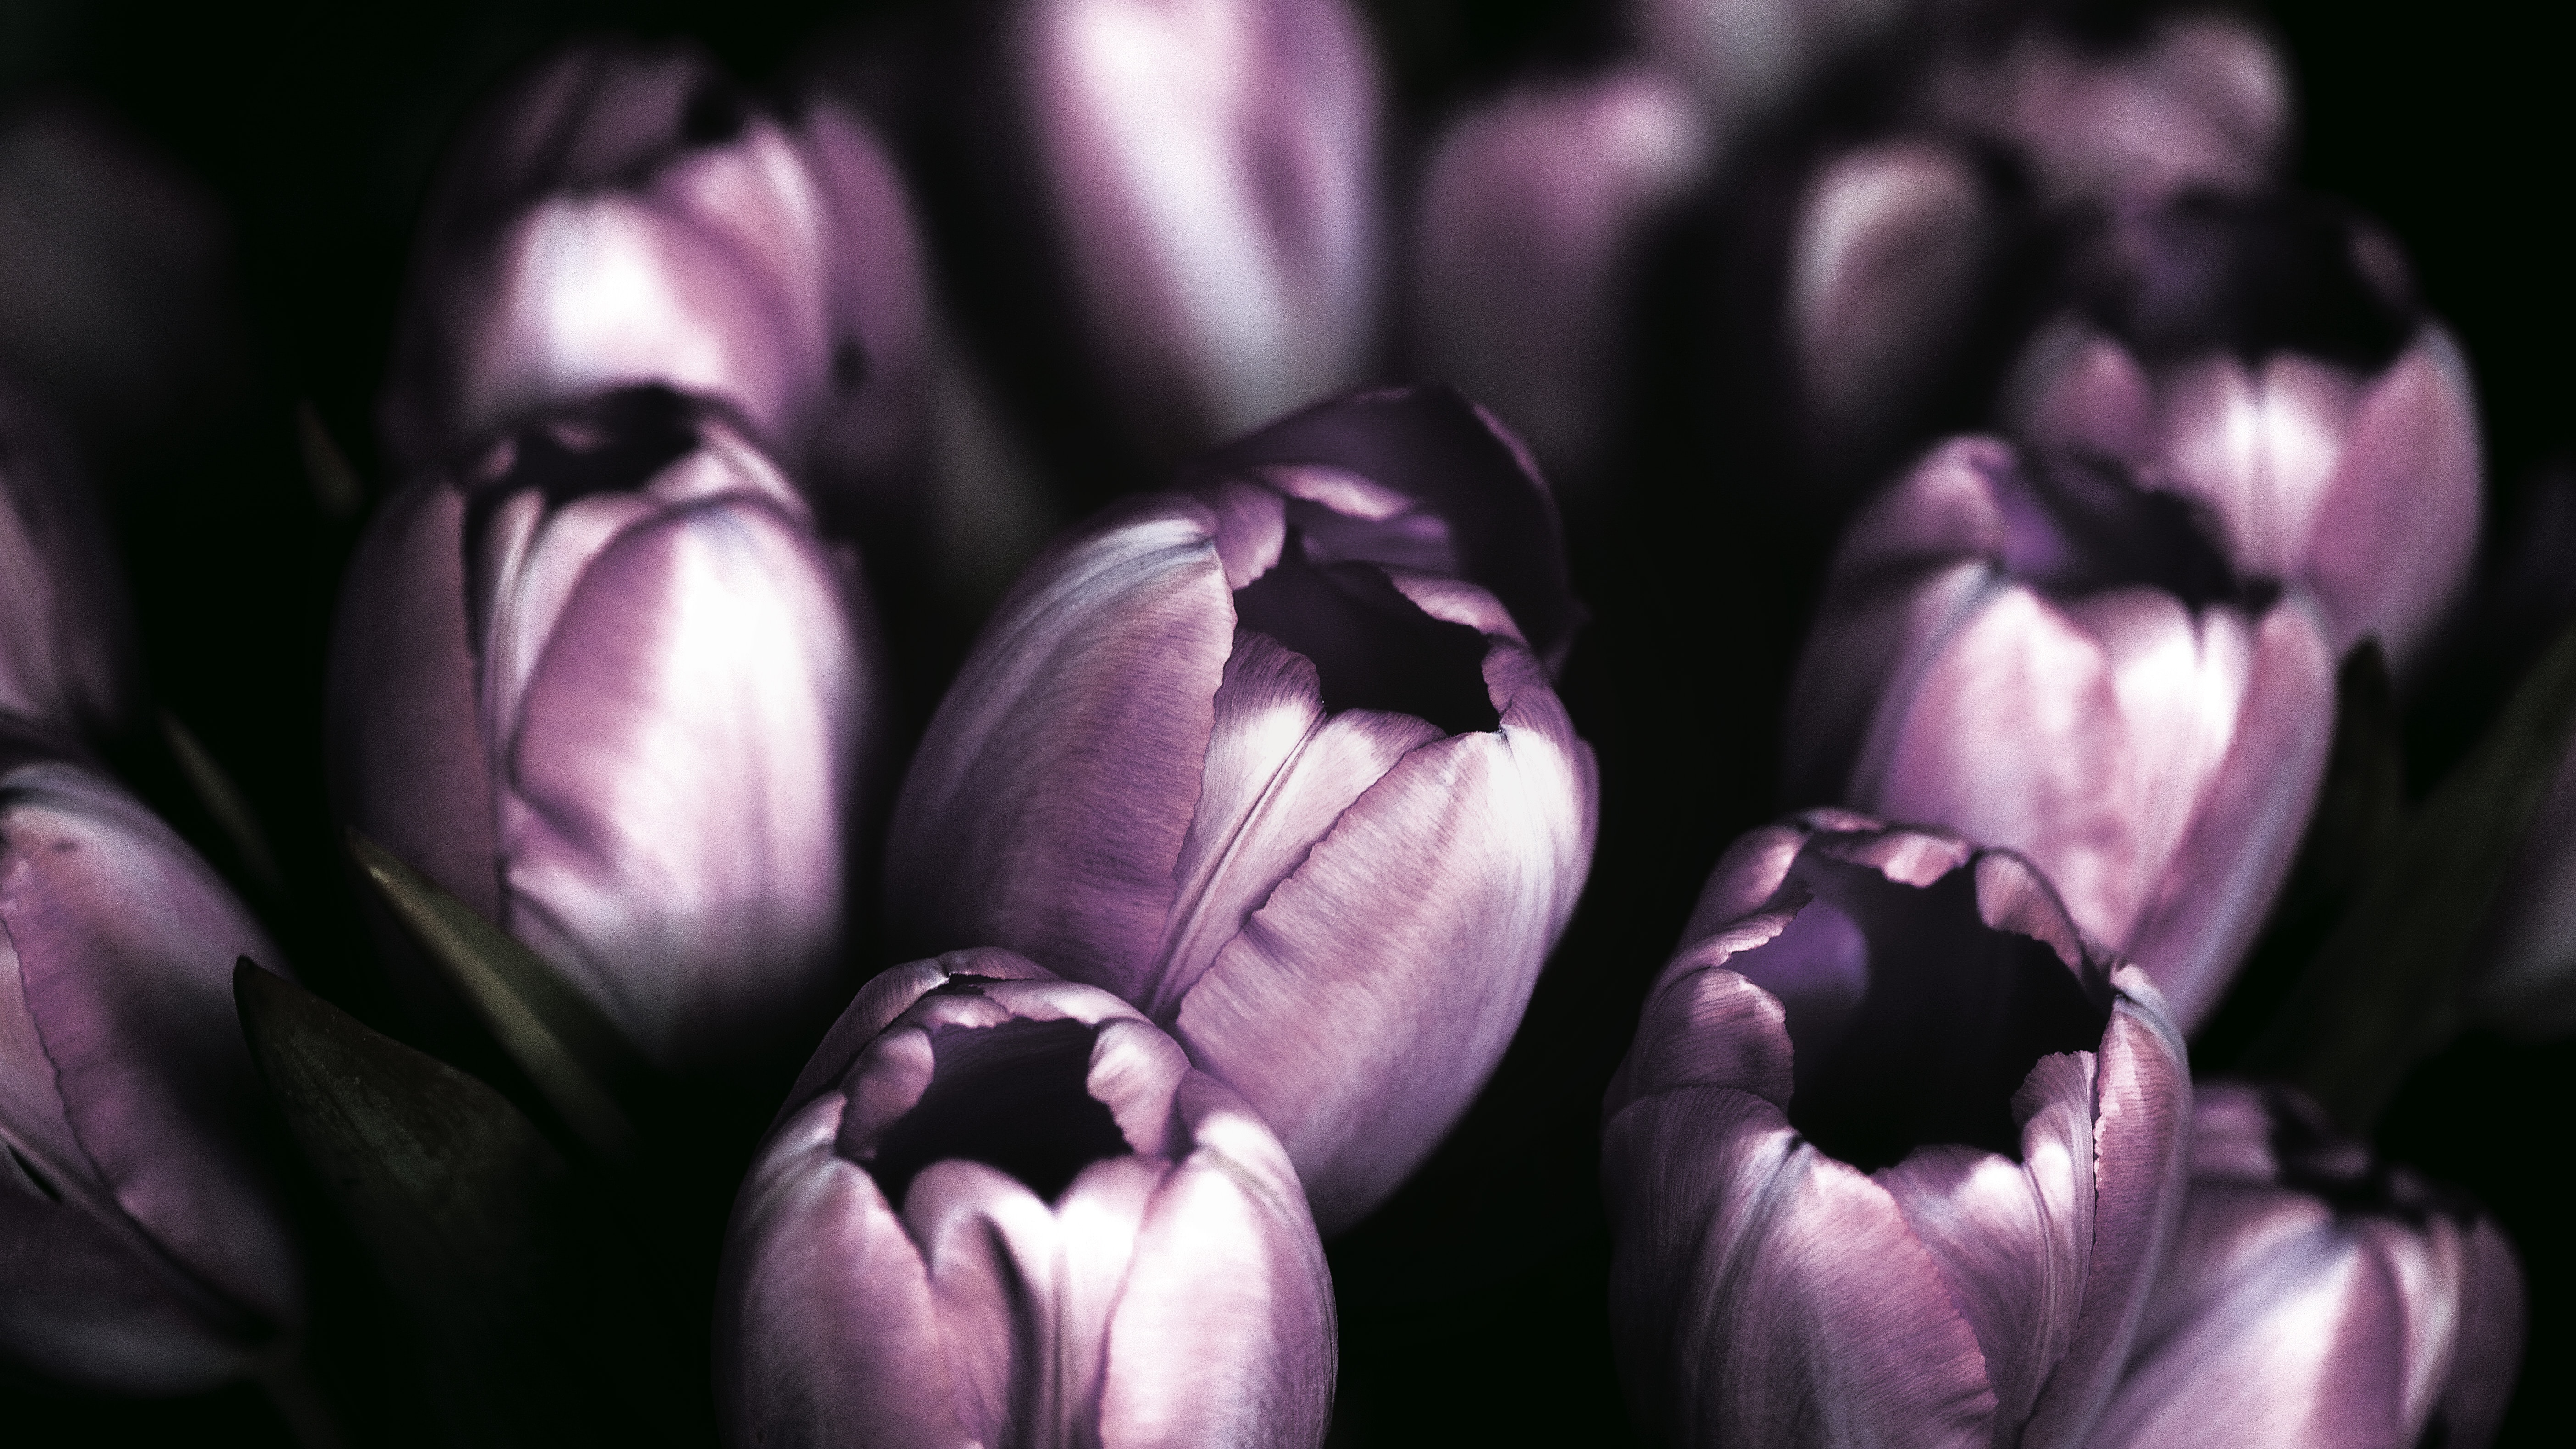 Flowers in dark shade